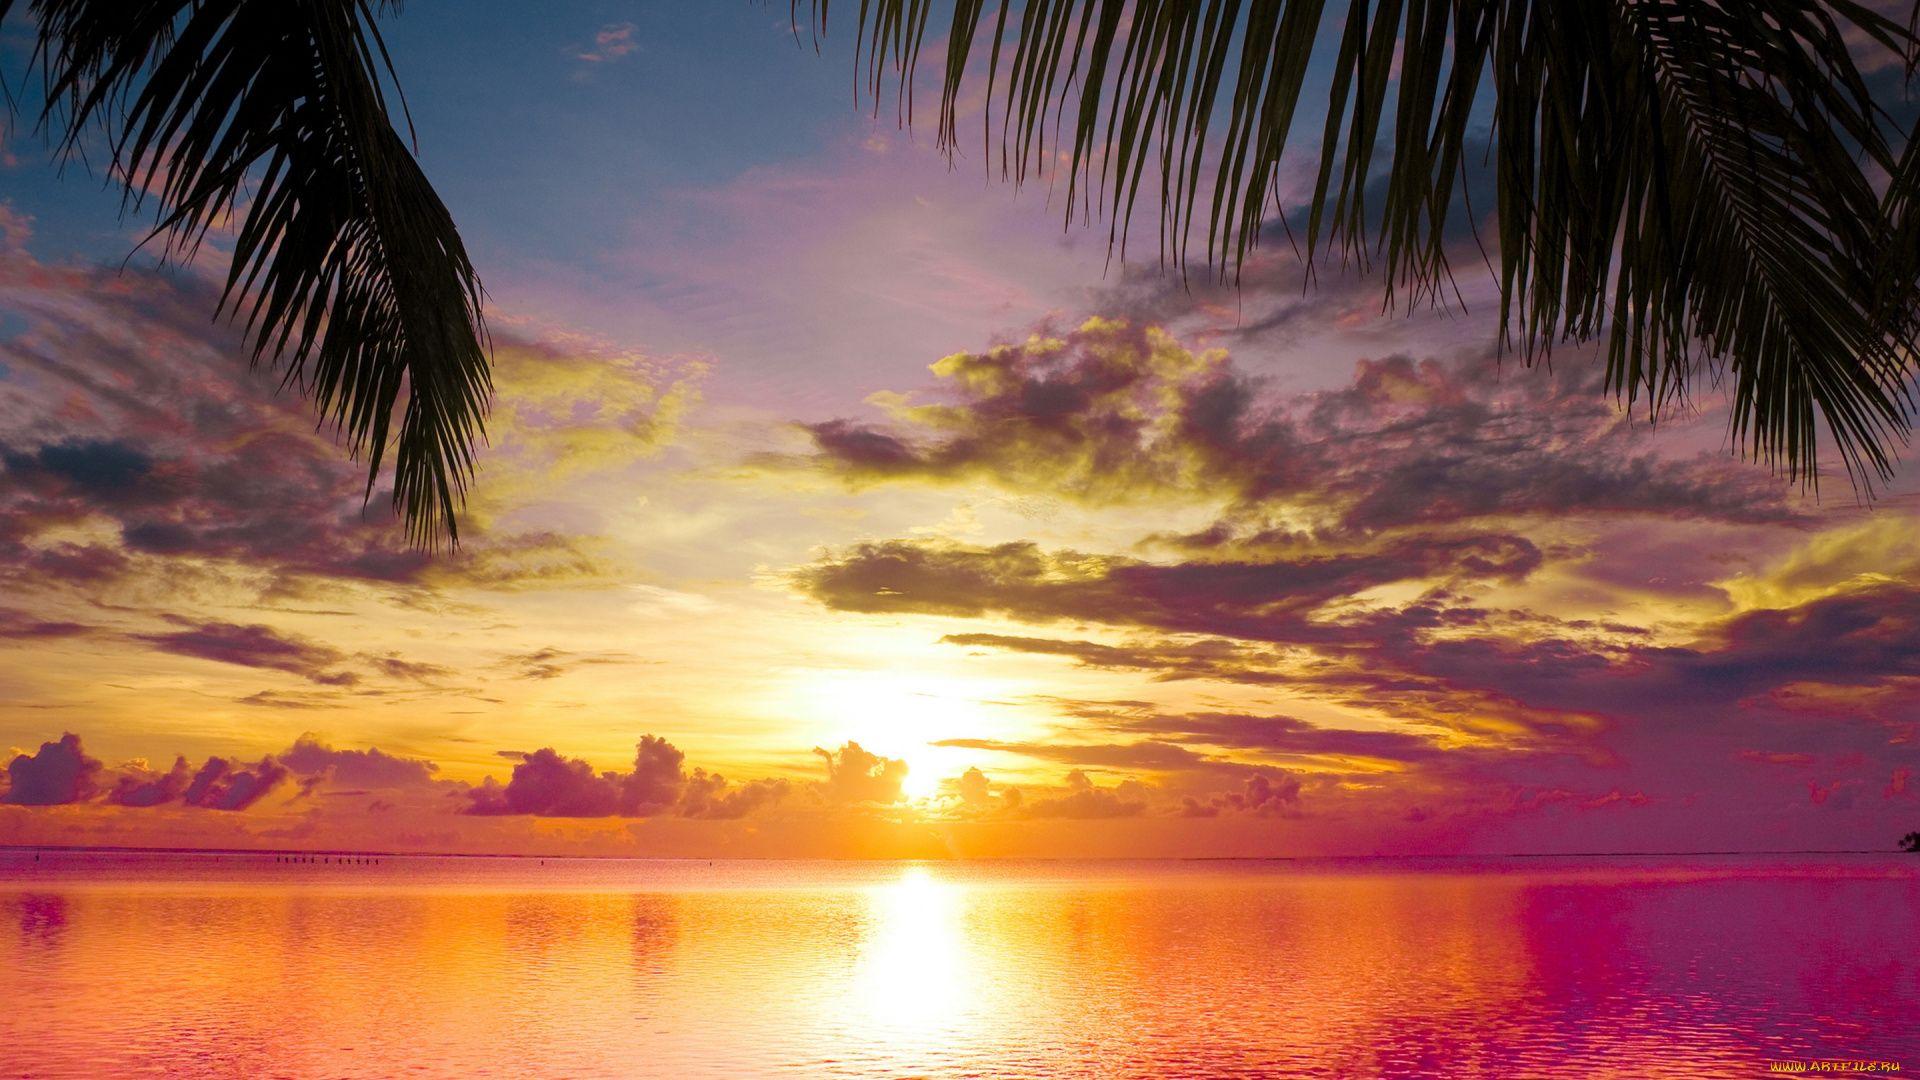 Palm Tree Sunset desktop background free